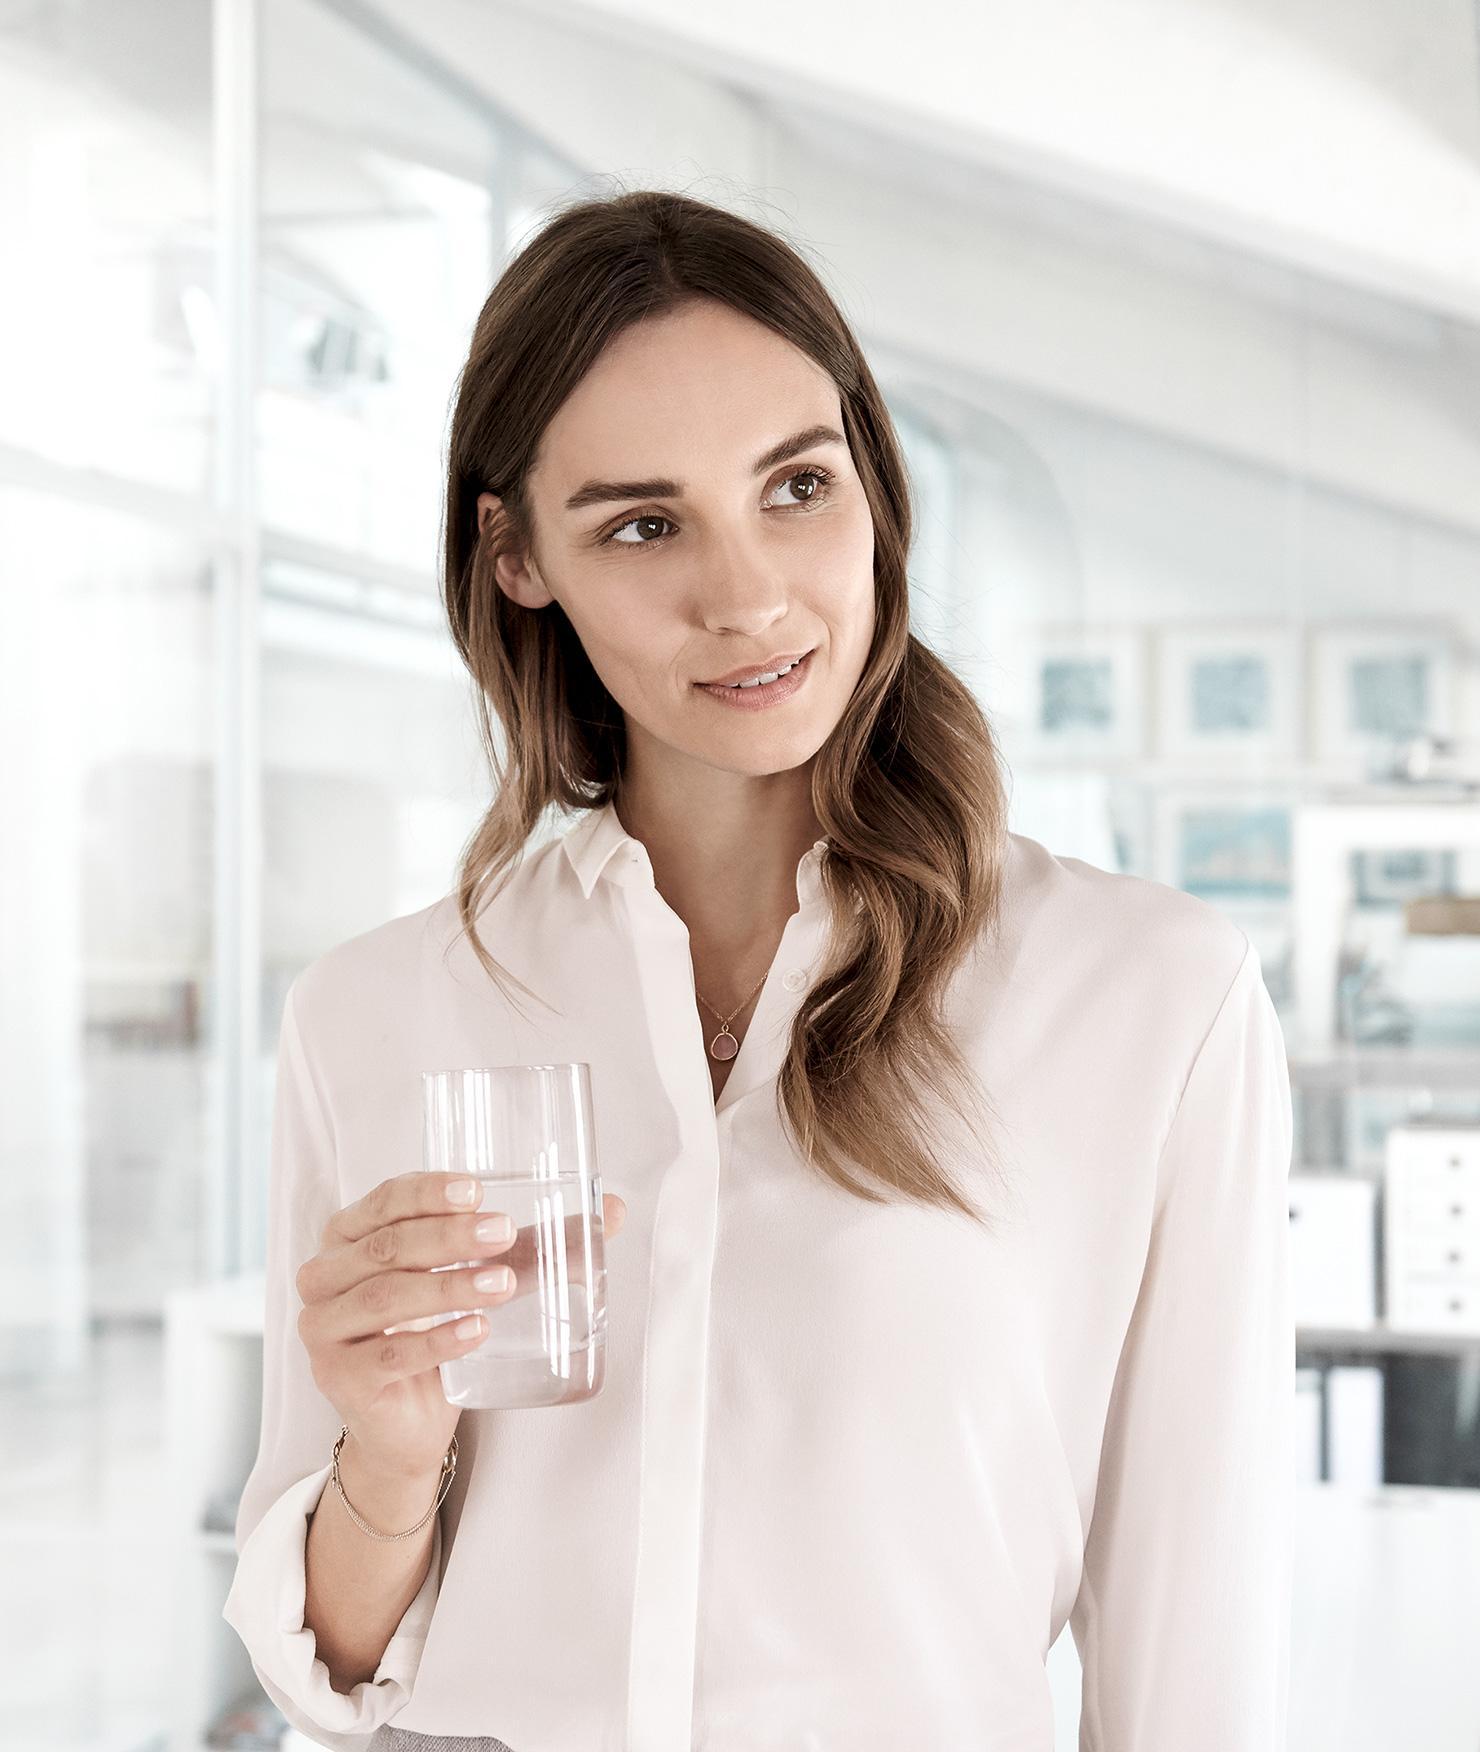 BRITA filter PURITY C 1000 AC office woman glass